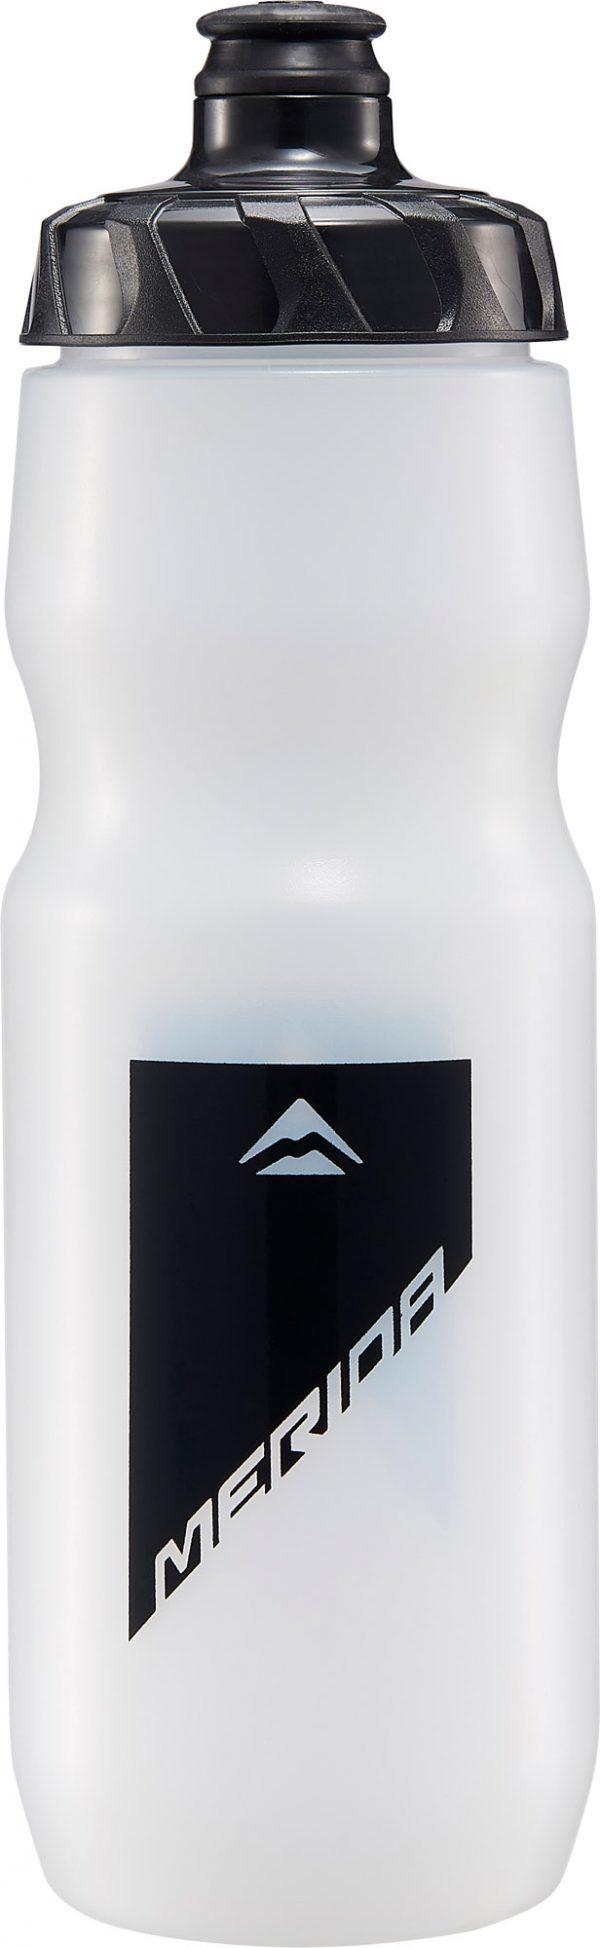 Фляга Merida Bottle/Transparent Black 800 мл